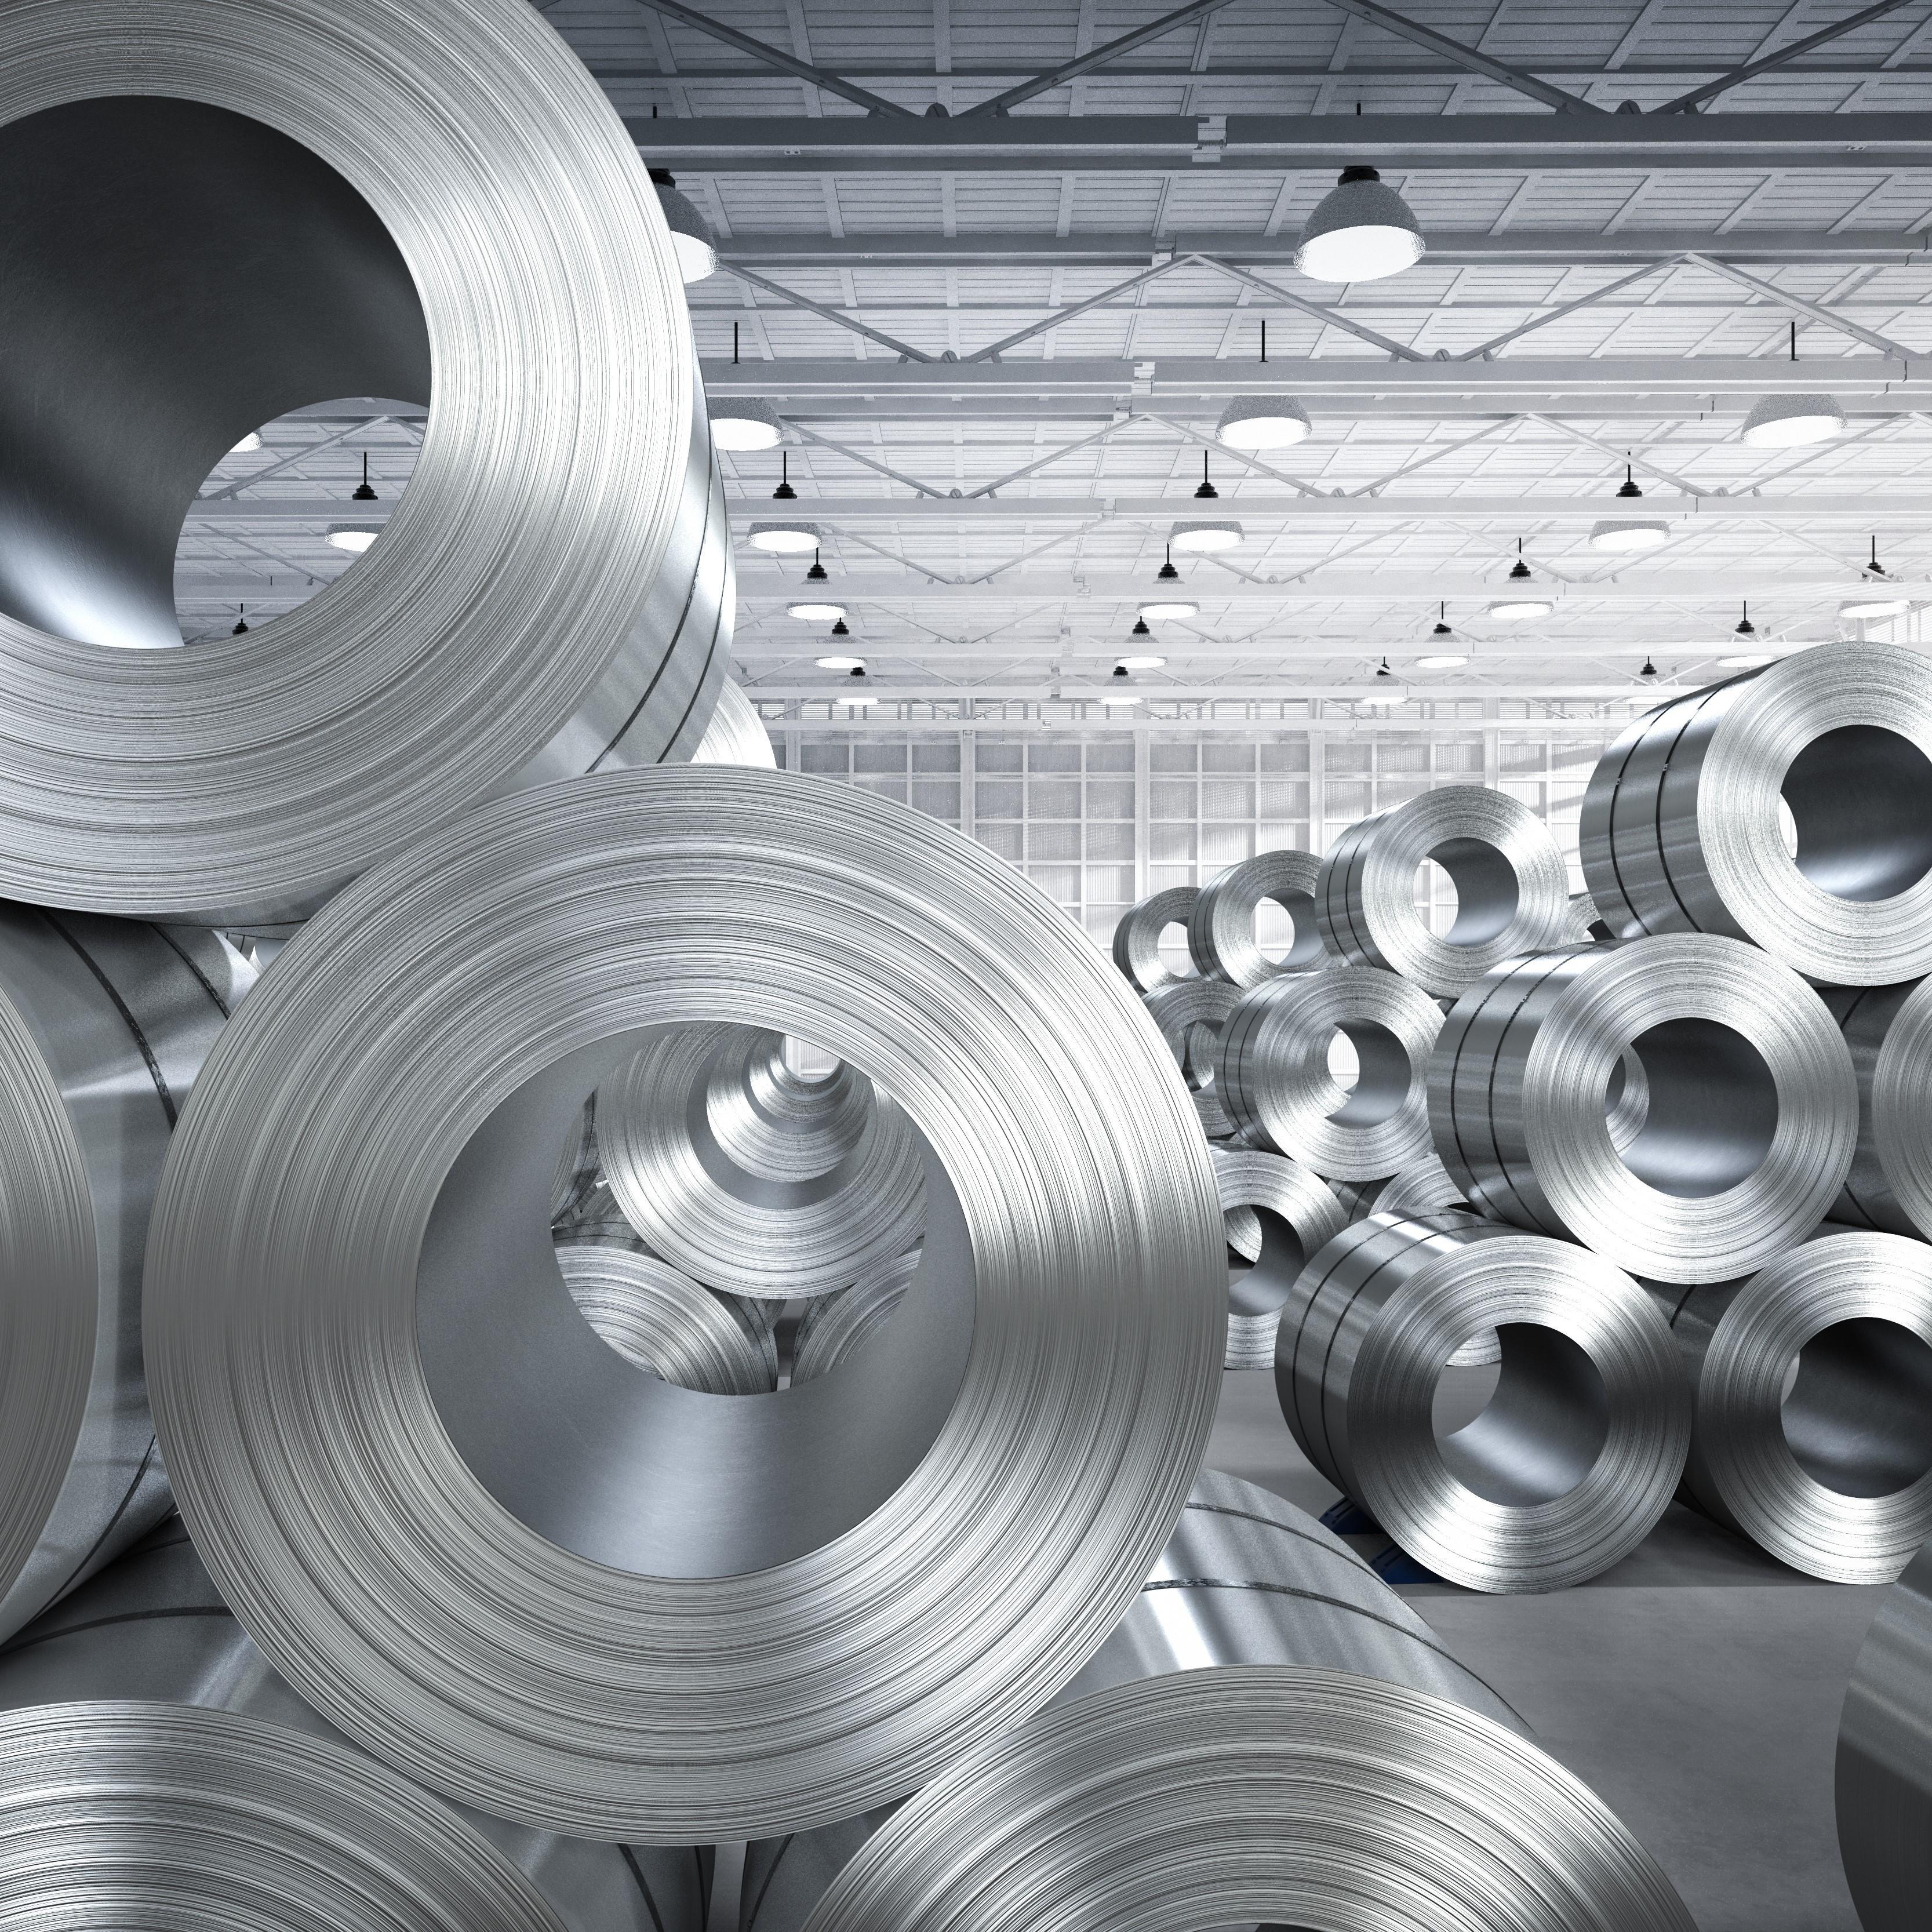 uploads///US steel stocks